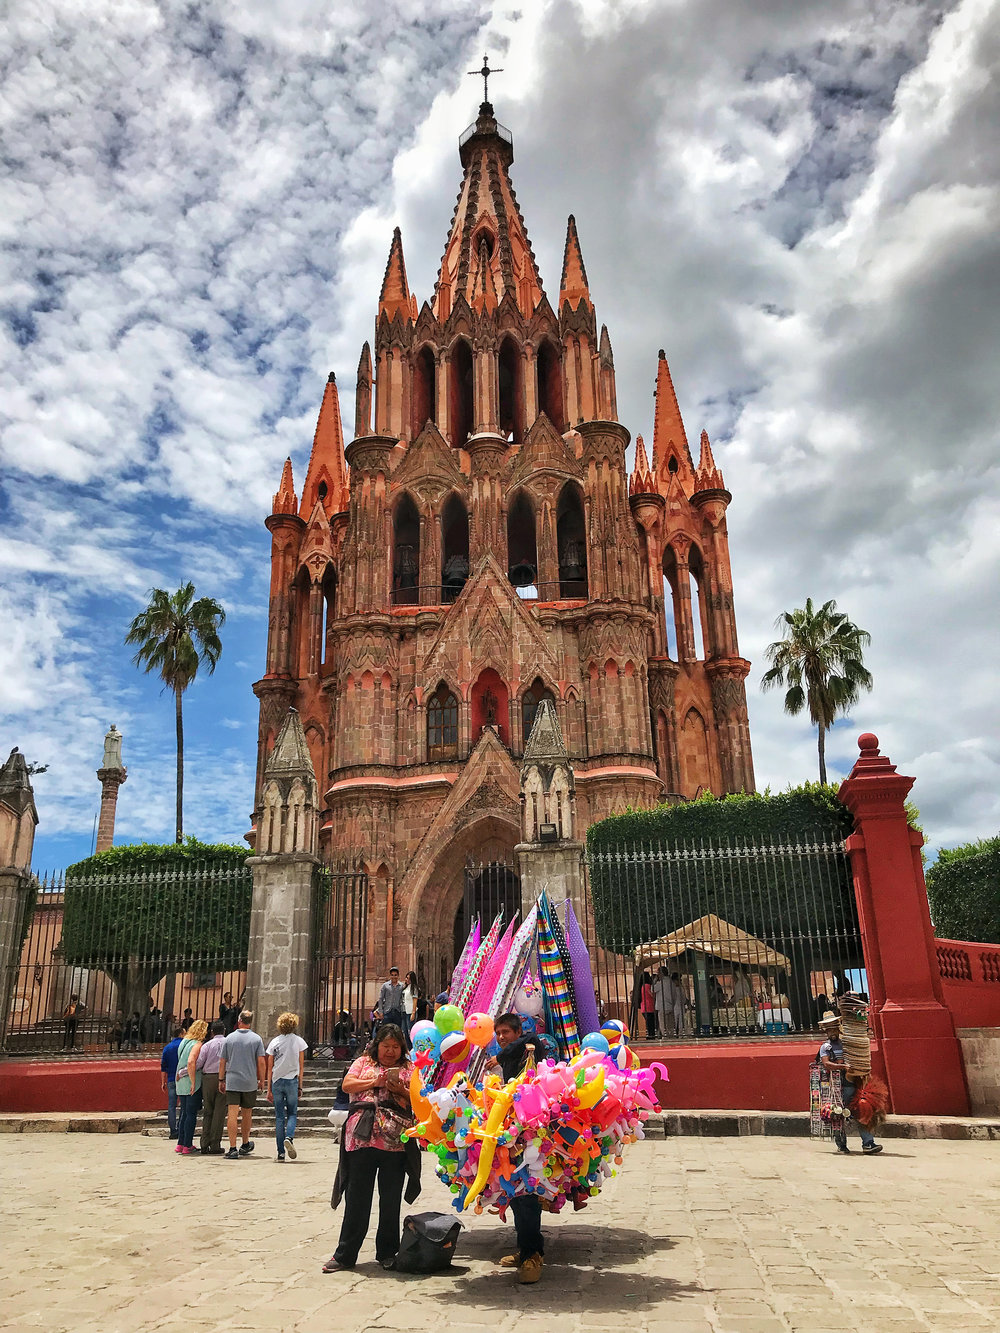 Balloon Vendor in front of the church of San Miguel de Allende.